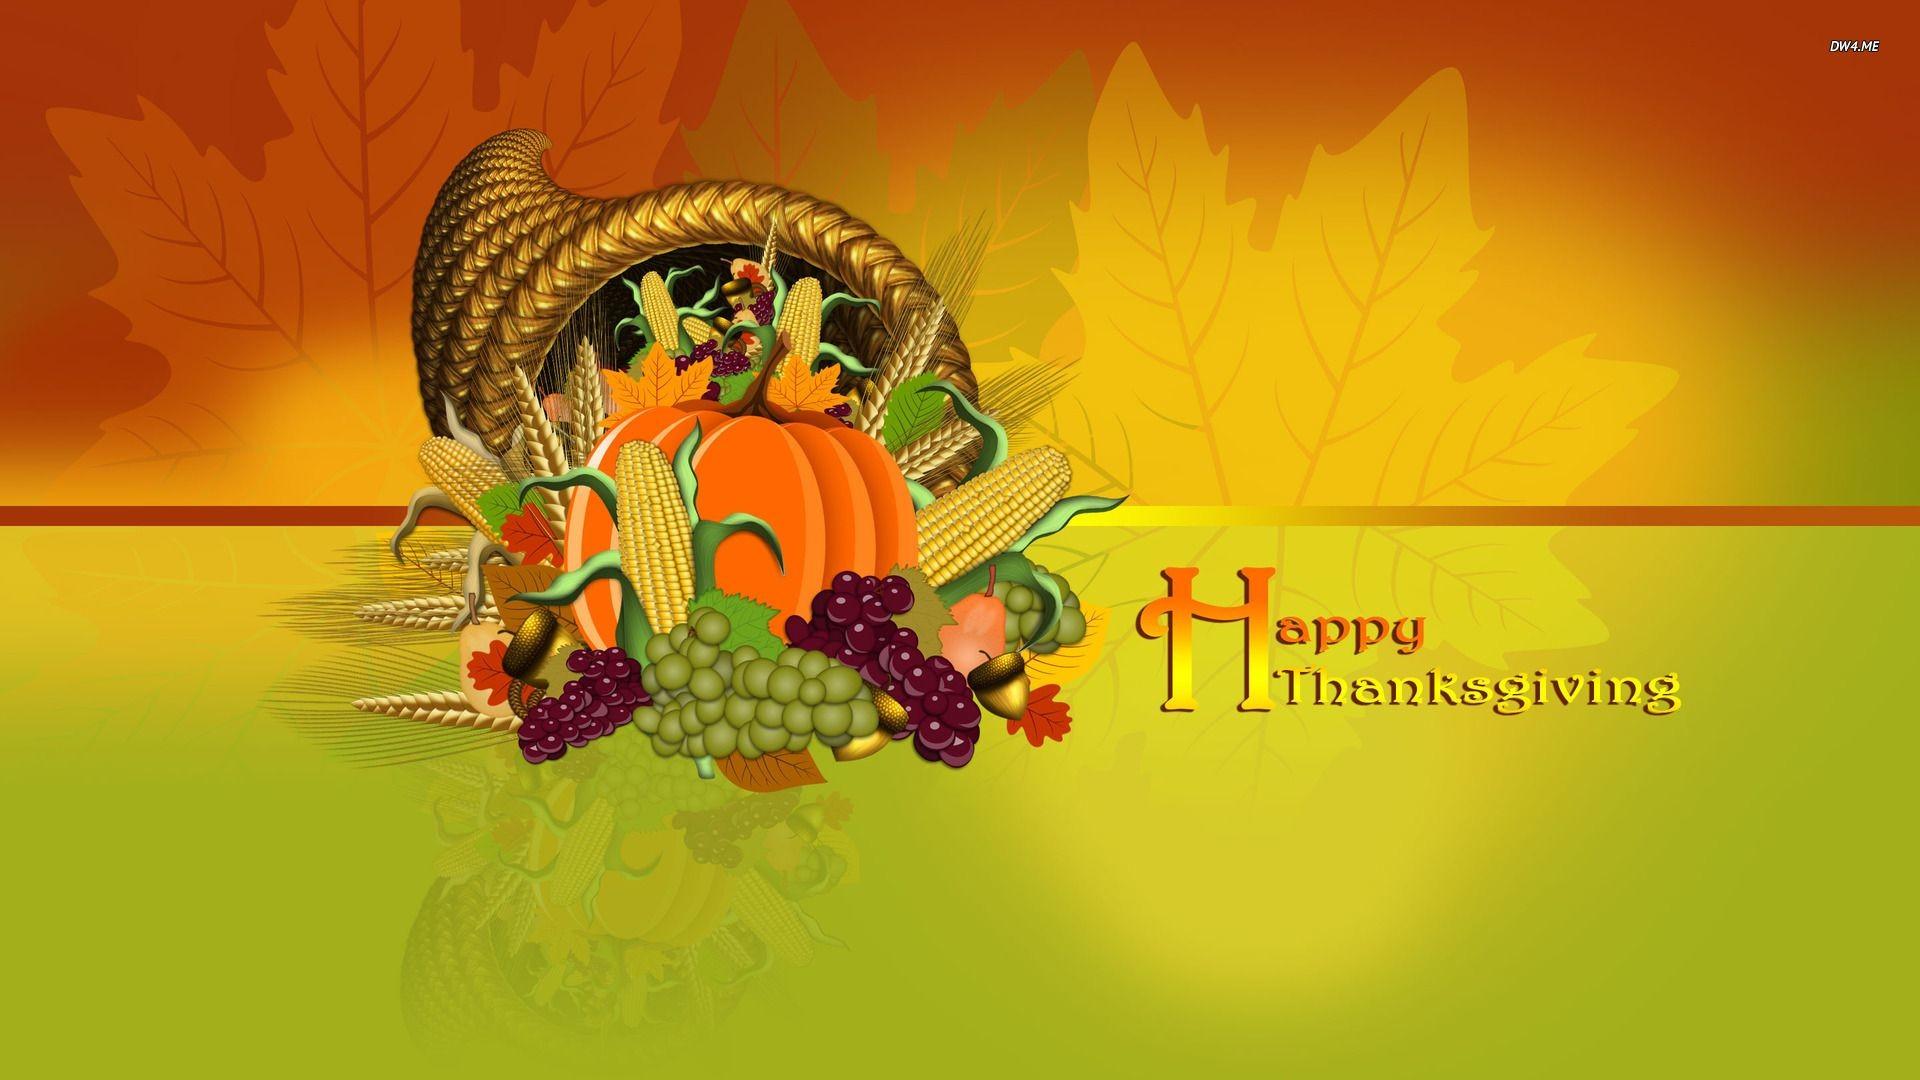 Happy Thanksgiving Wallpaper HD